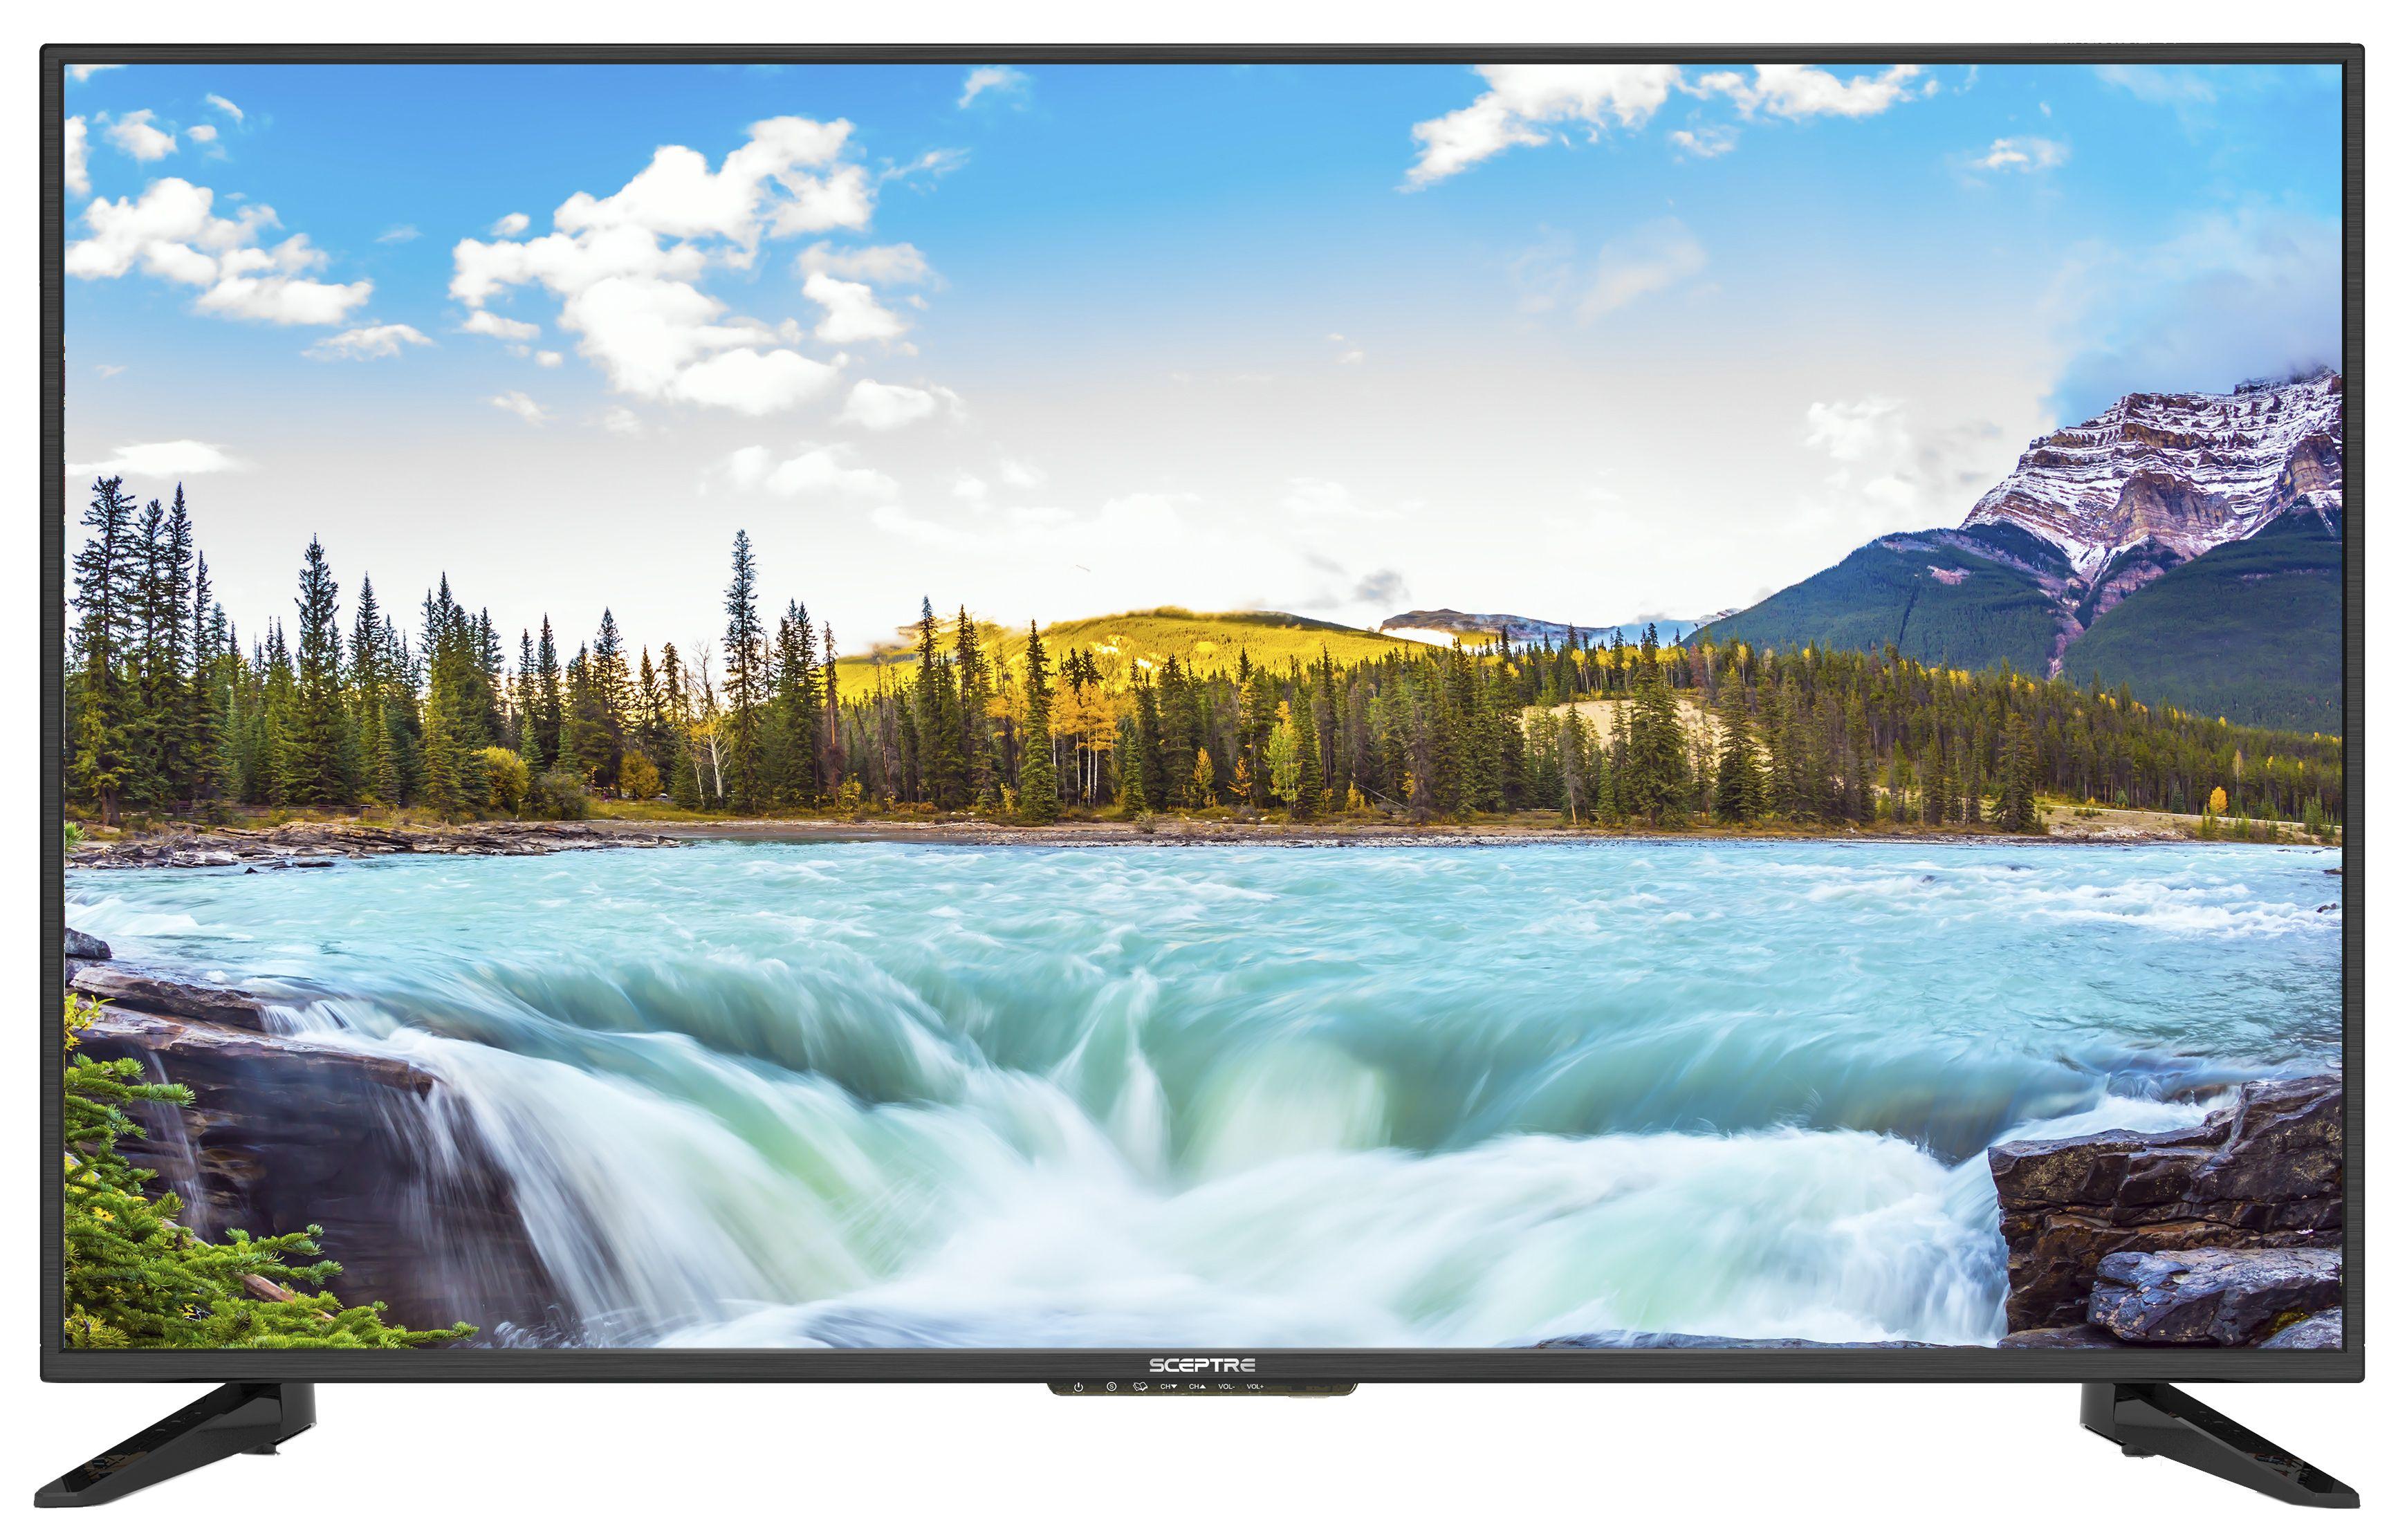 Sceptre 50 Class Fhd 1080p Led Tv X505bv Fsr Peyzaj Duzenlemesi Fikirleri Peyzaj Duzenlemesi Peyzaj